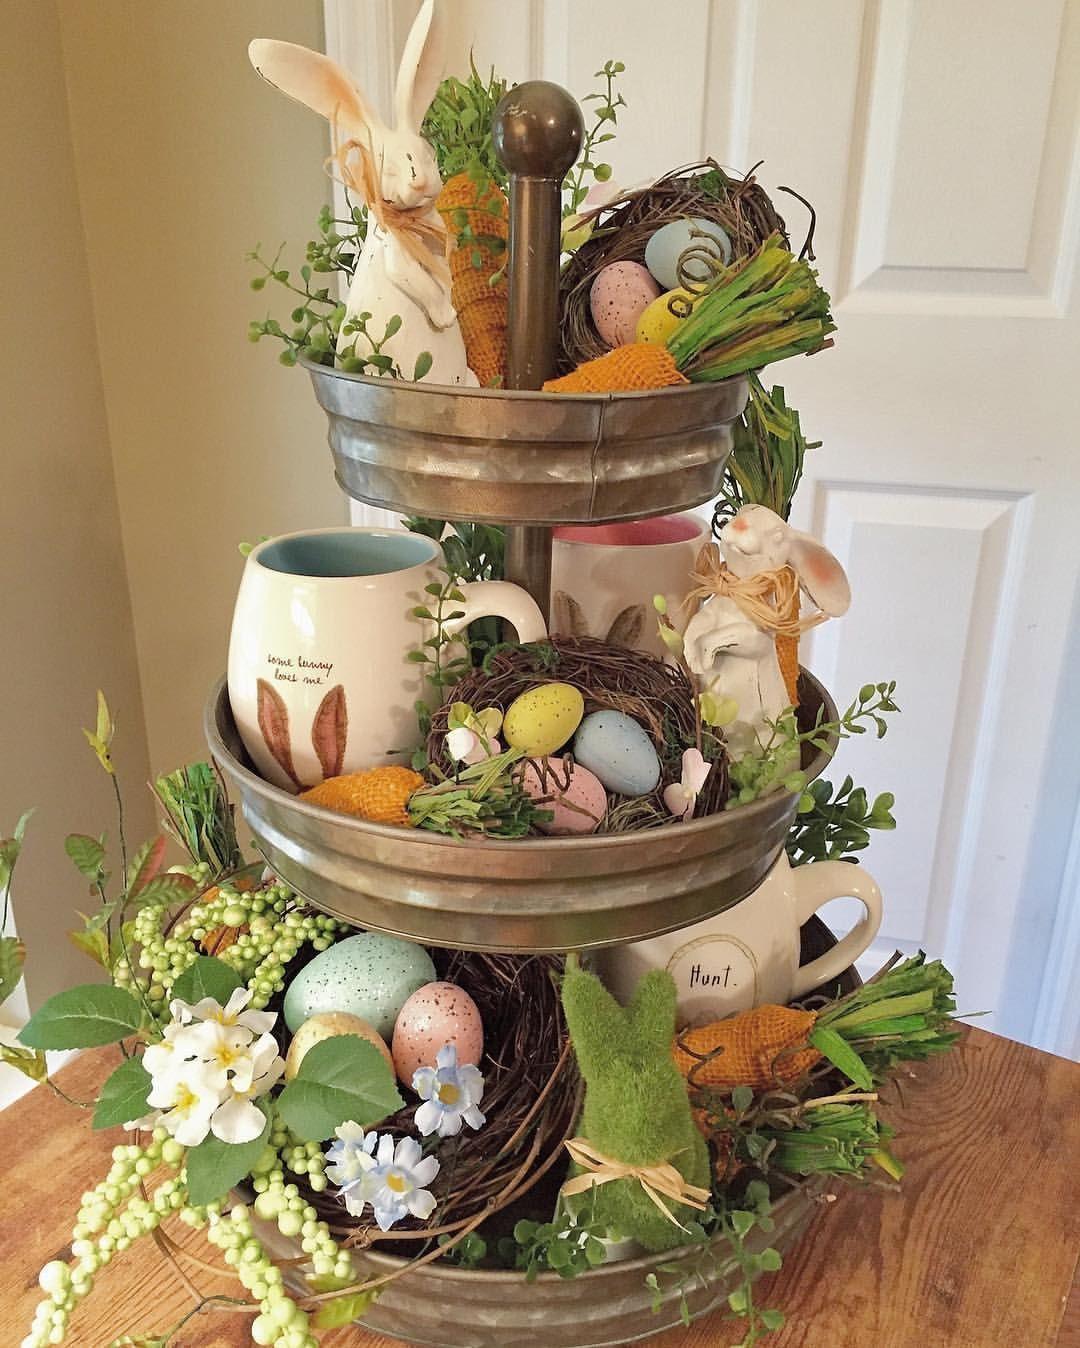 22 Diy Easter Decorations Decoratop Diy Easter Decorations Spring Easter Decor Easter Diy